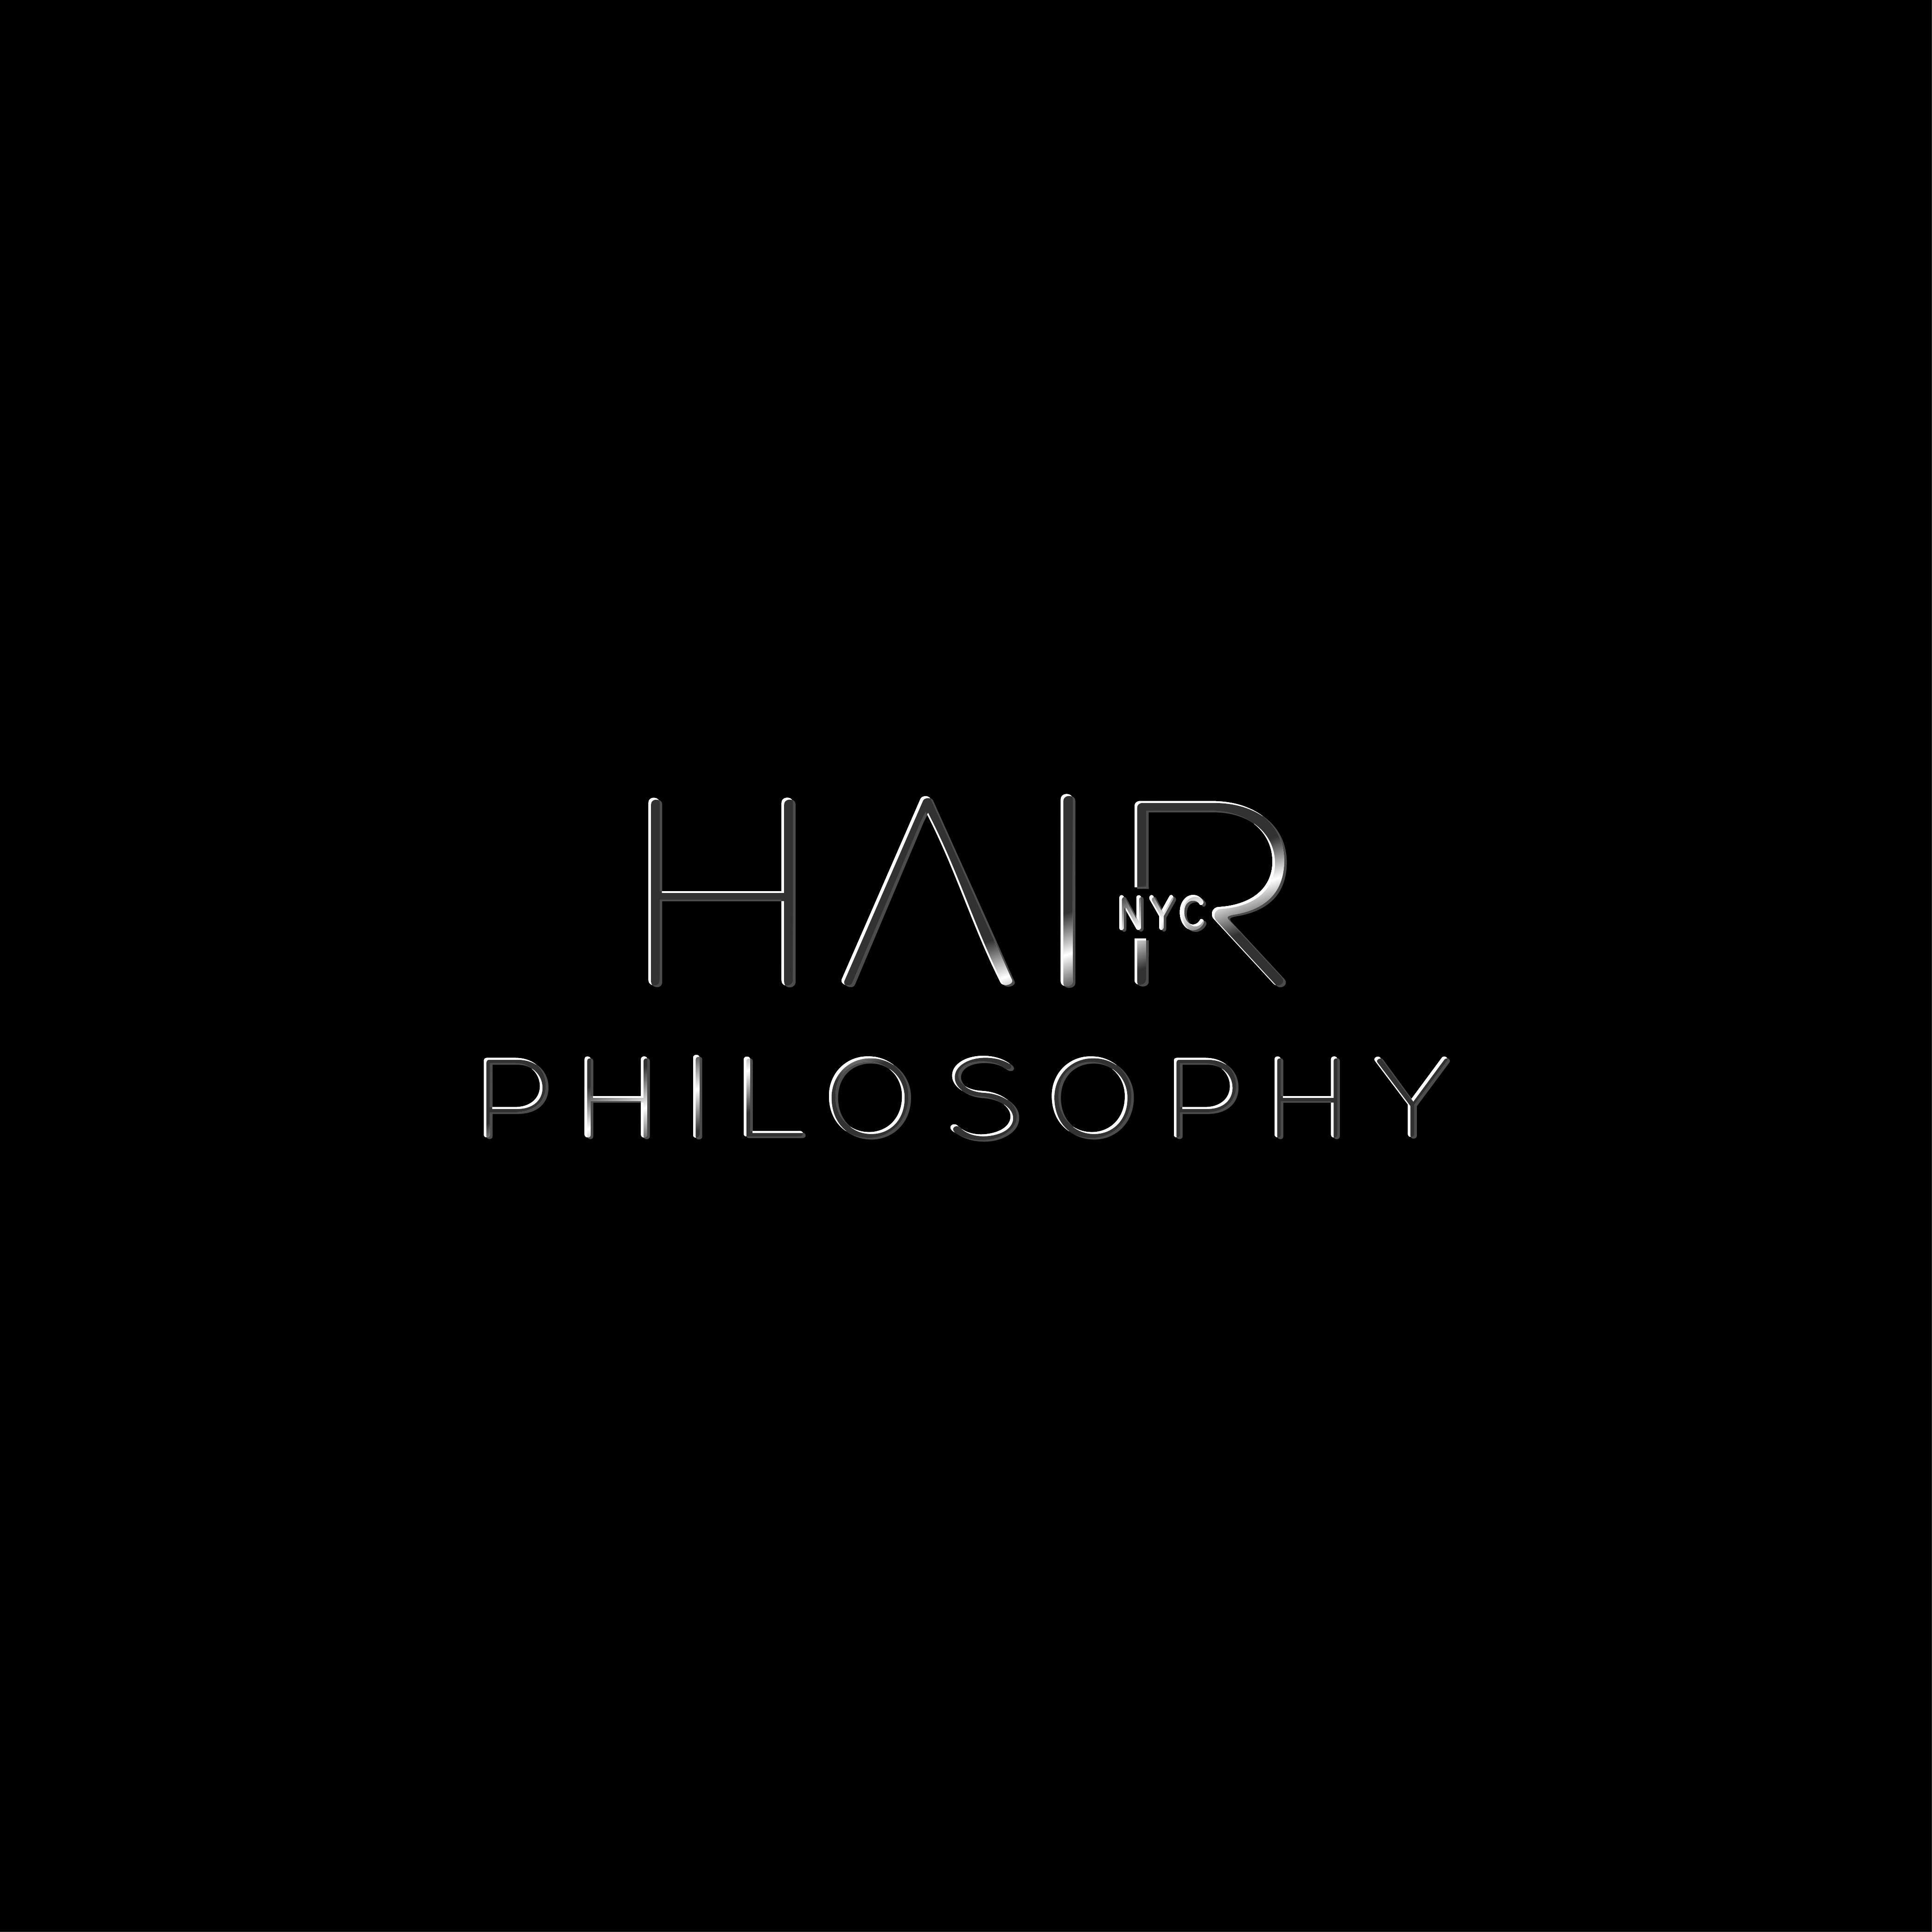 Hair Philosophy needs a high end elegant new logo.